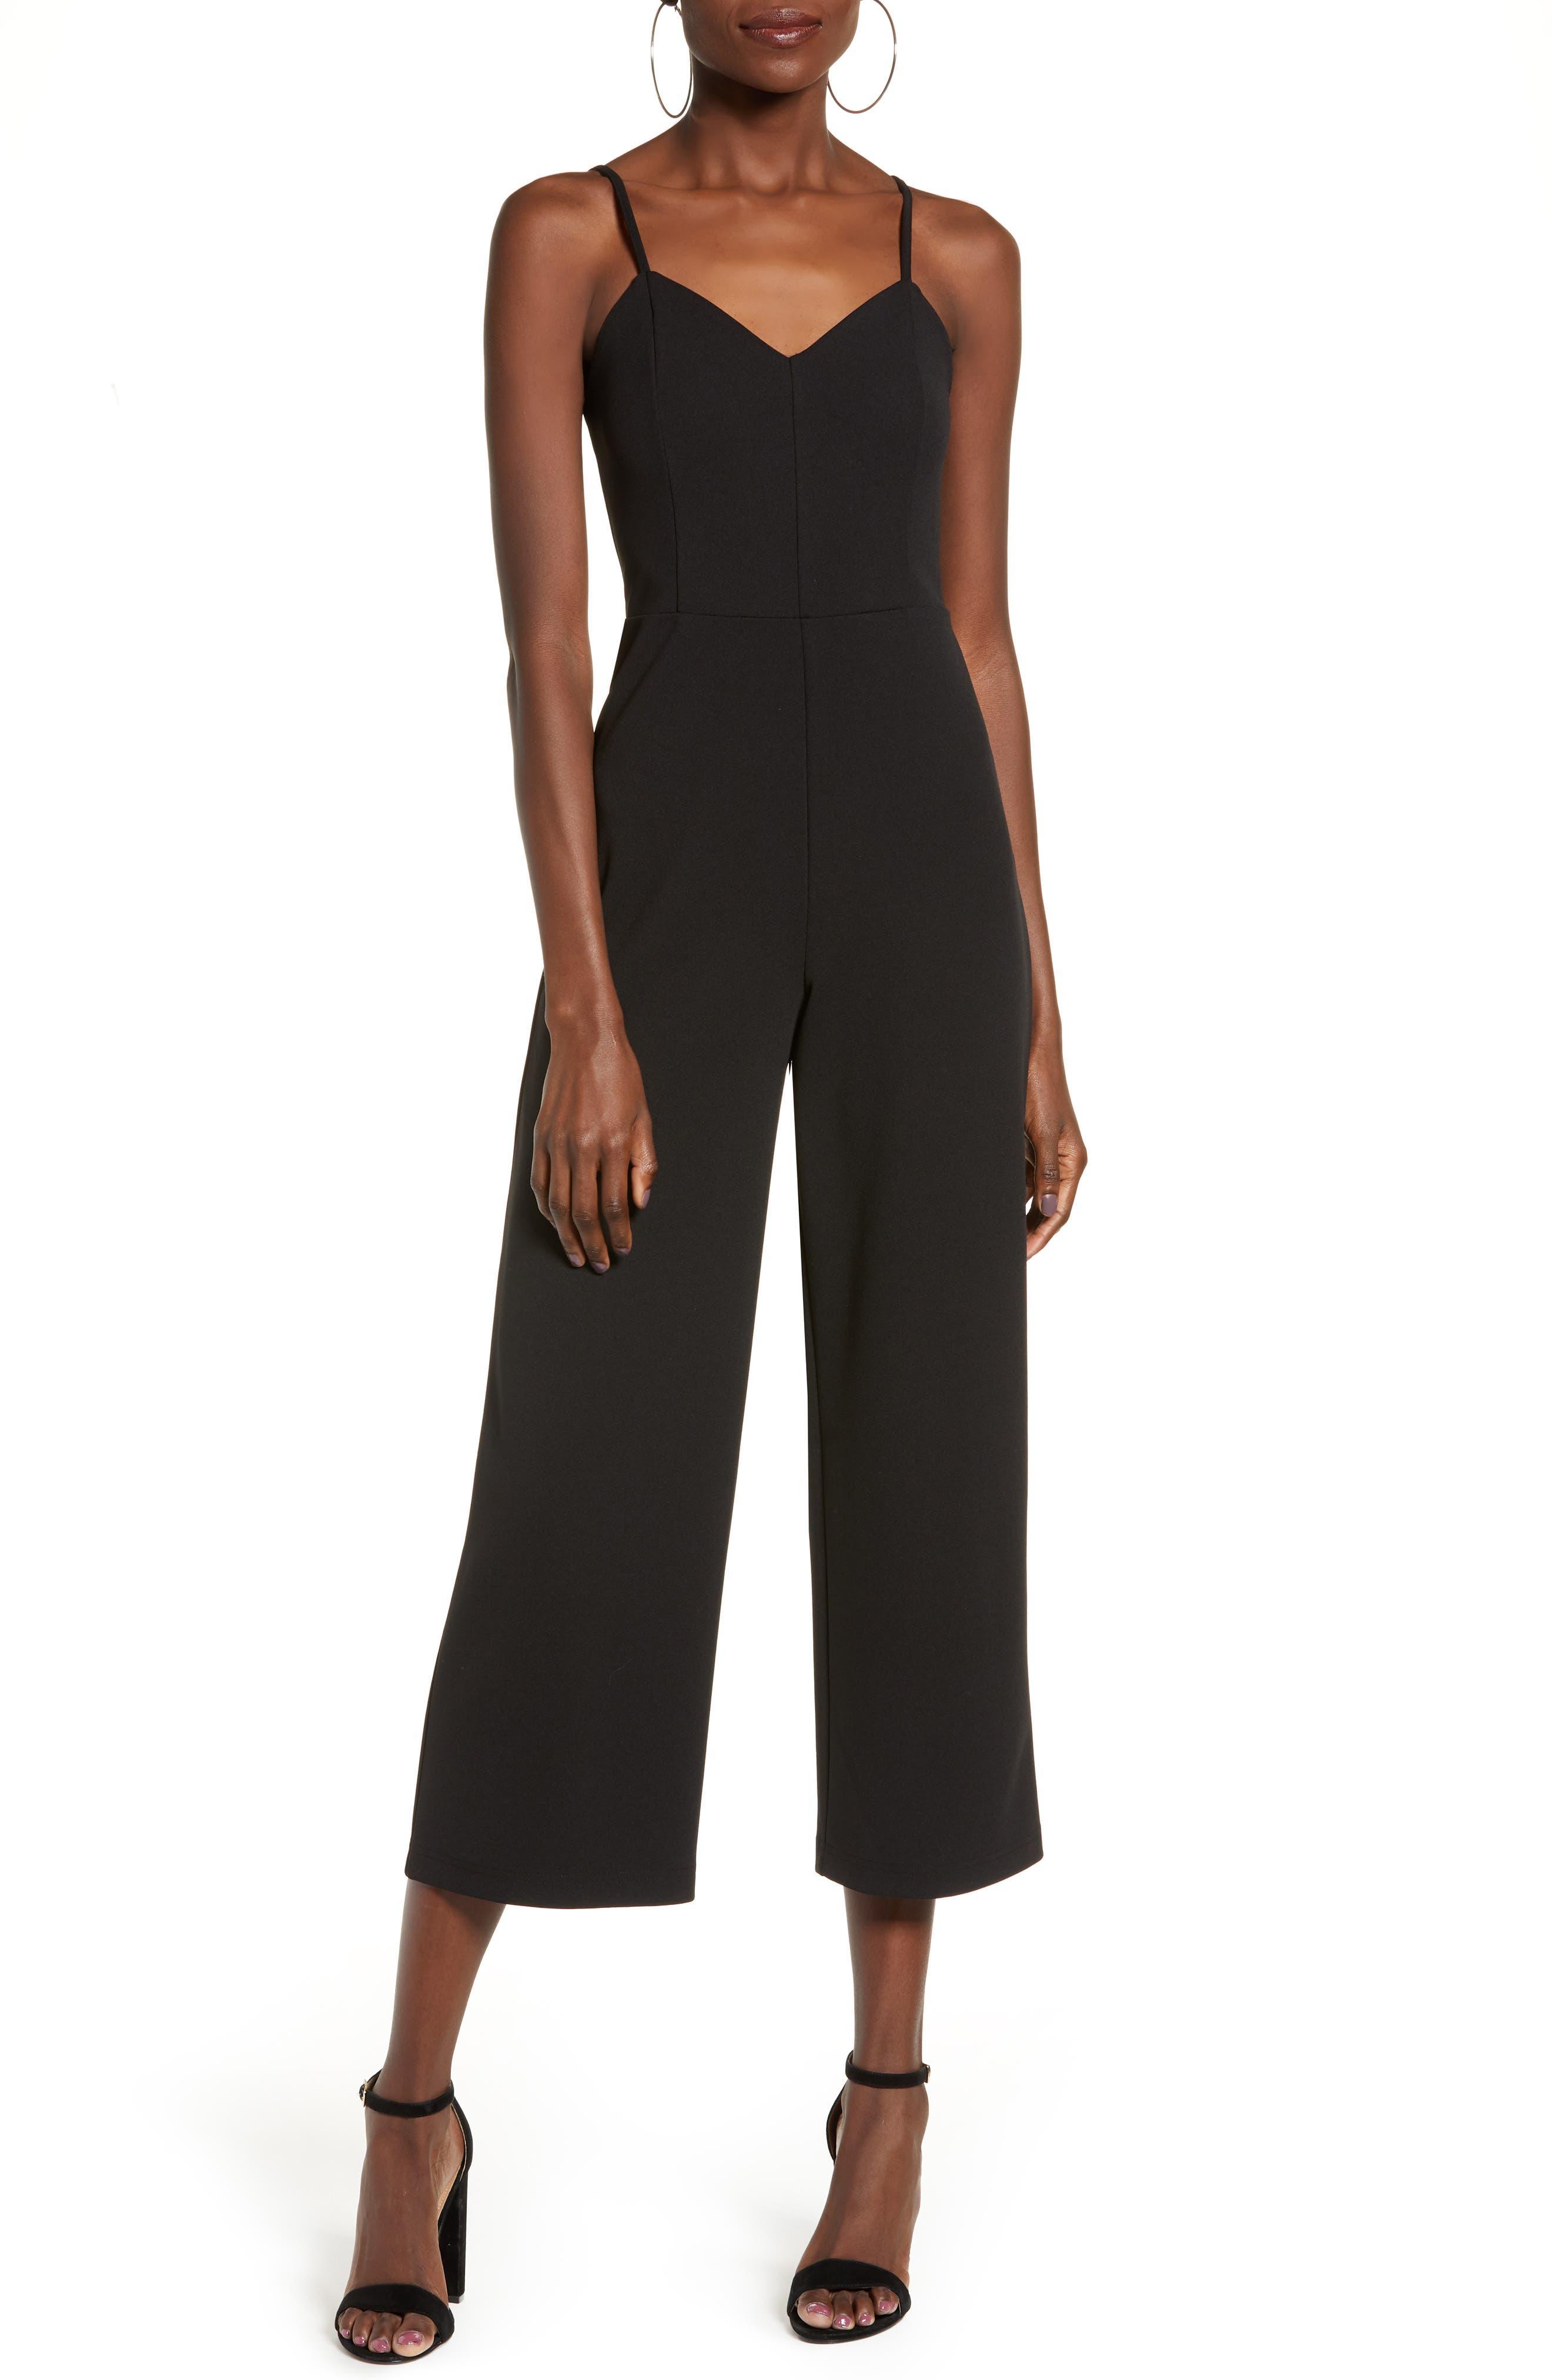 Black Prom Dress Size 00